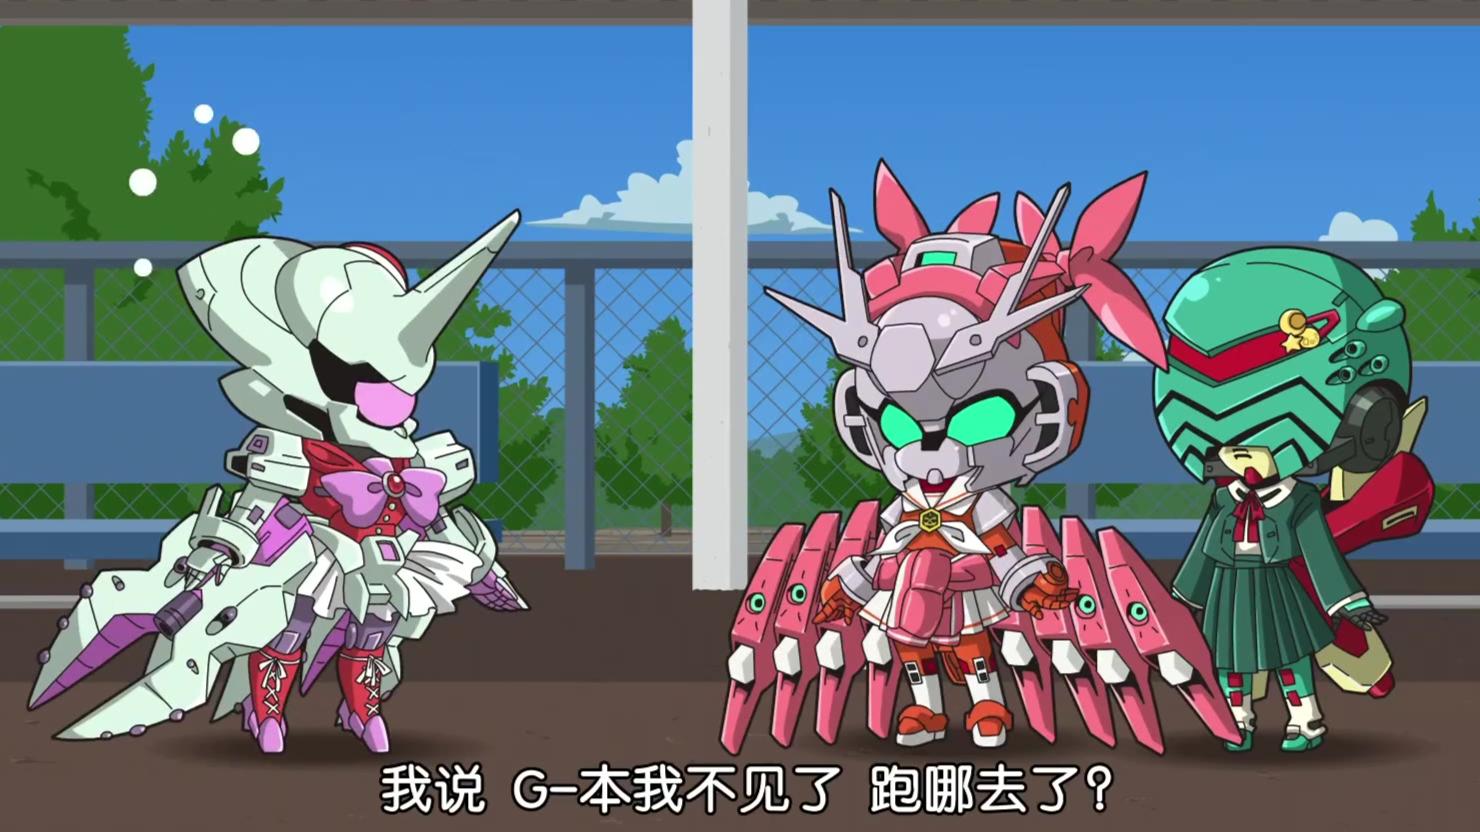 【NEO.QSW字幕】MS学园:G回归甲子园02-09